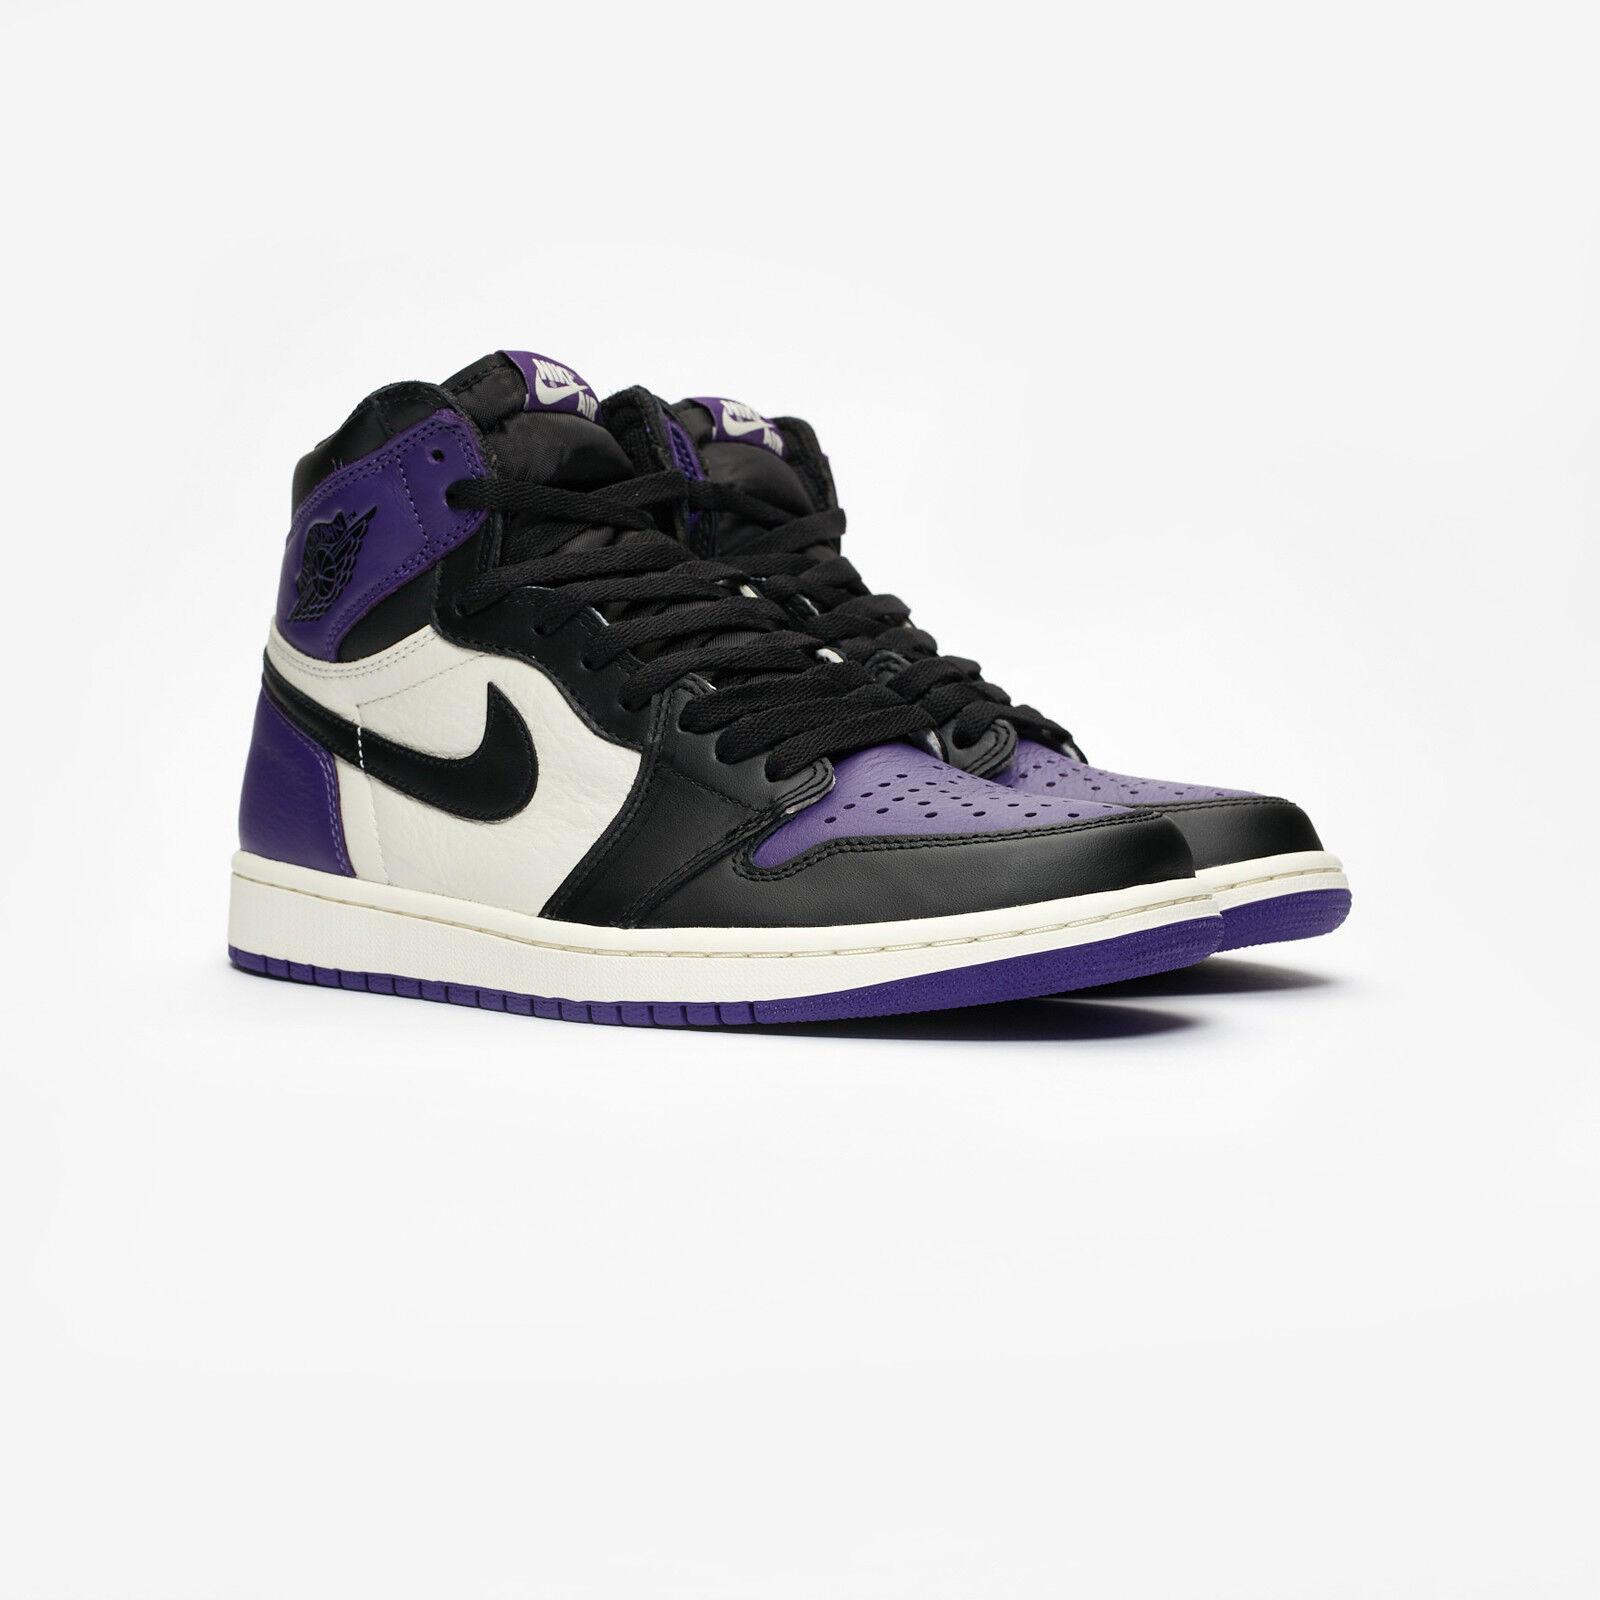 Nike Air Jordan Retro 1 OG High Court Purple 10.5 SB NRG